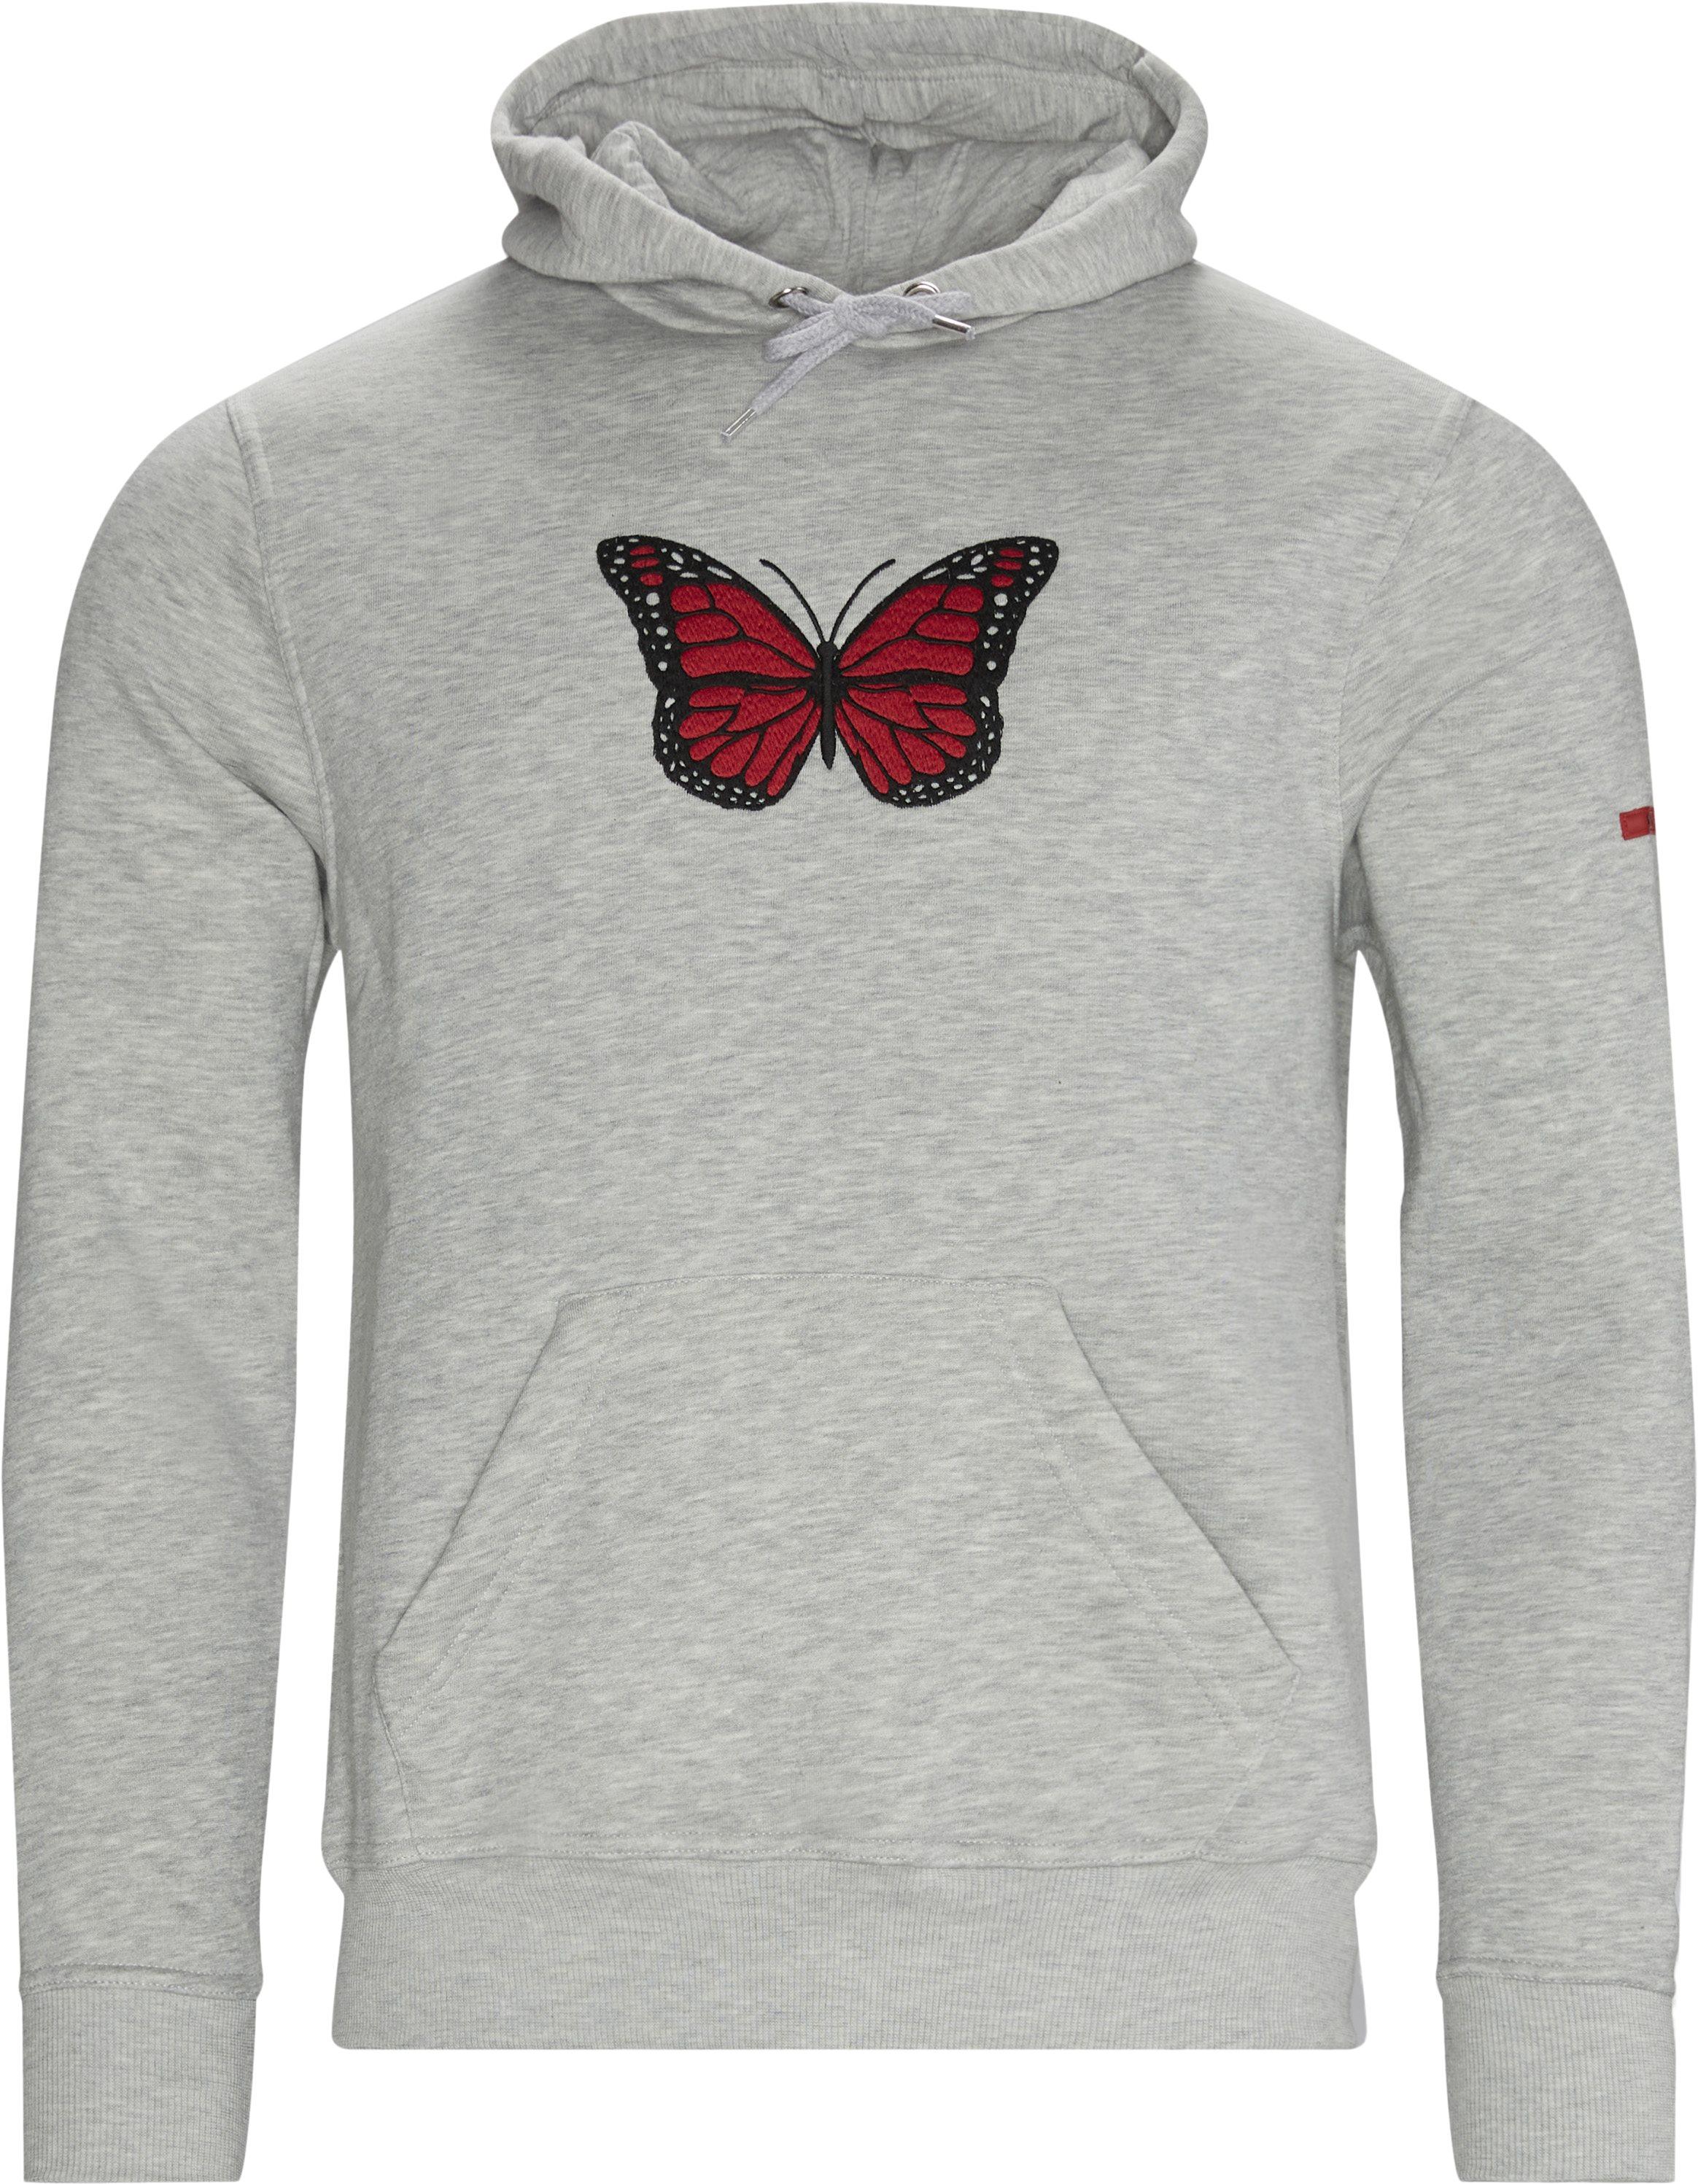 Butterfly Hoodie - Sweatshirts - Regular - Grå